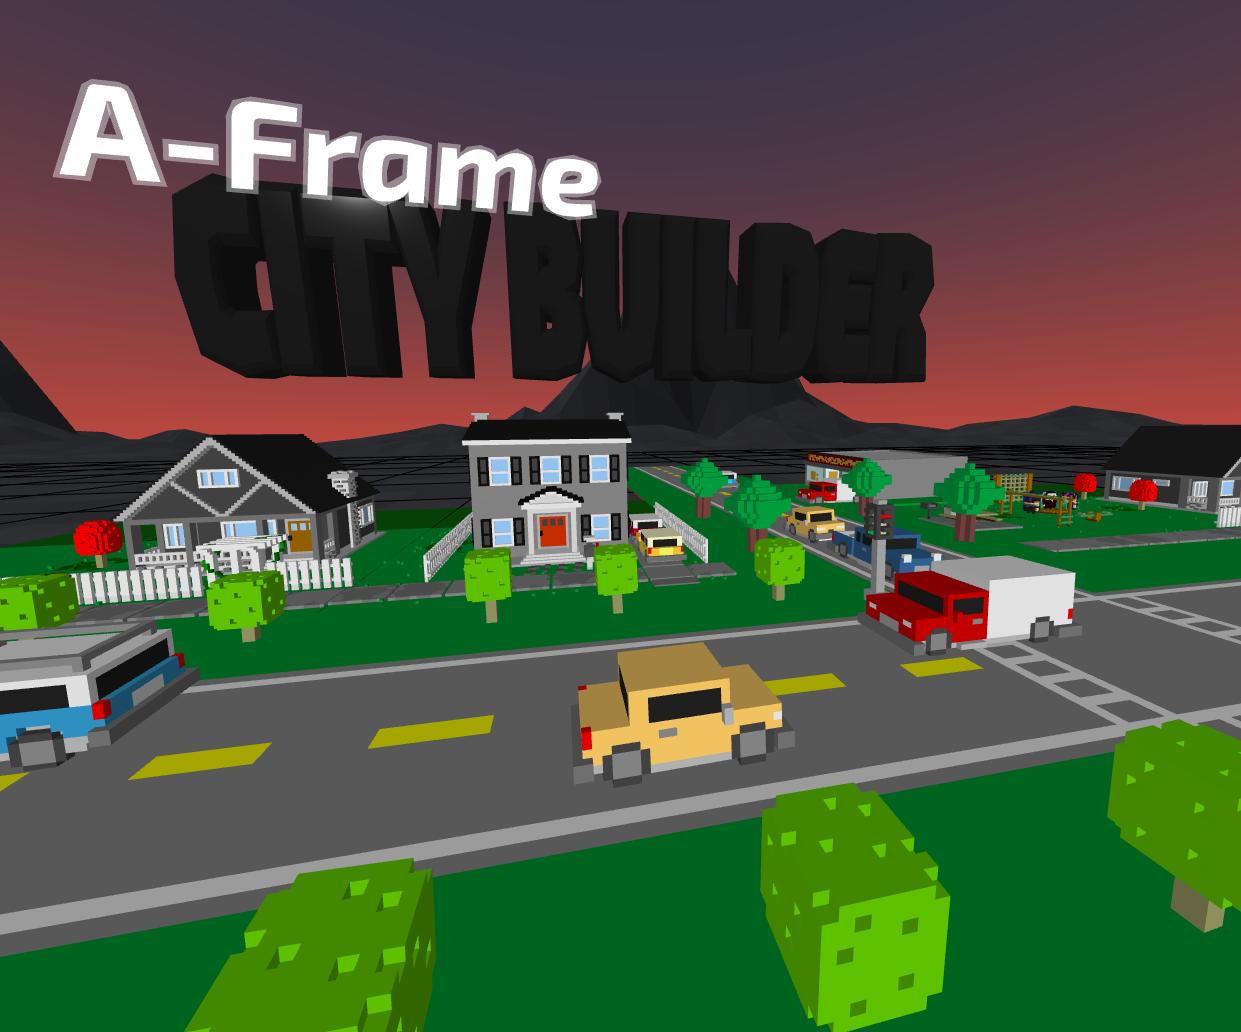 GitHub - kfarr/aframe-city-builder: 🏗 A-Frame project ...